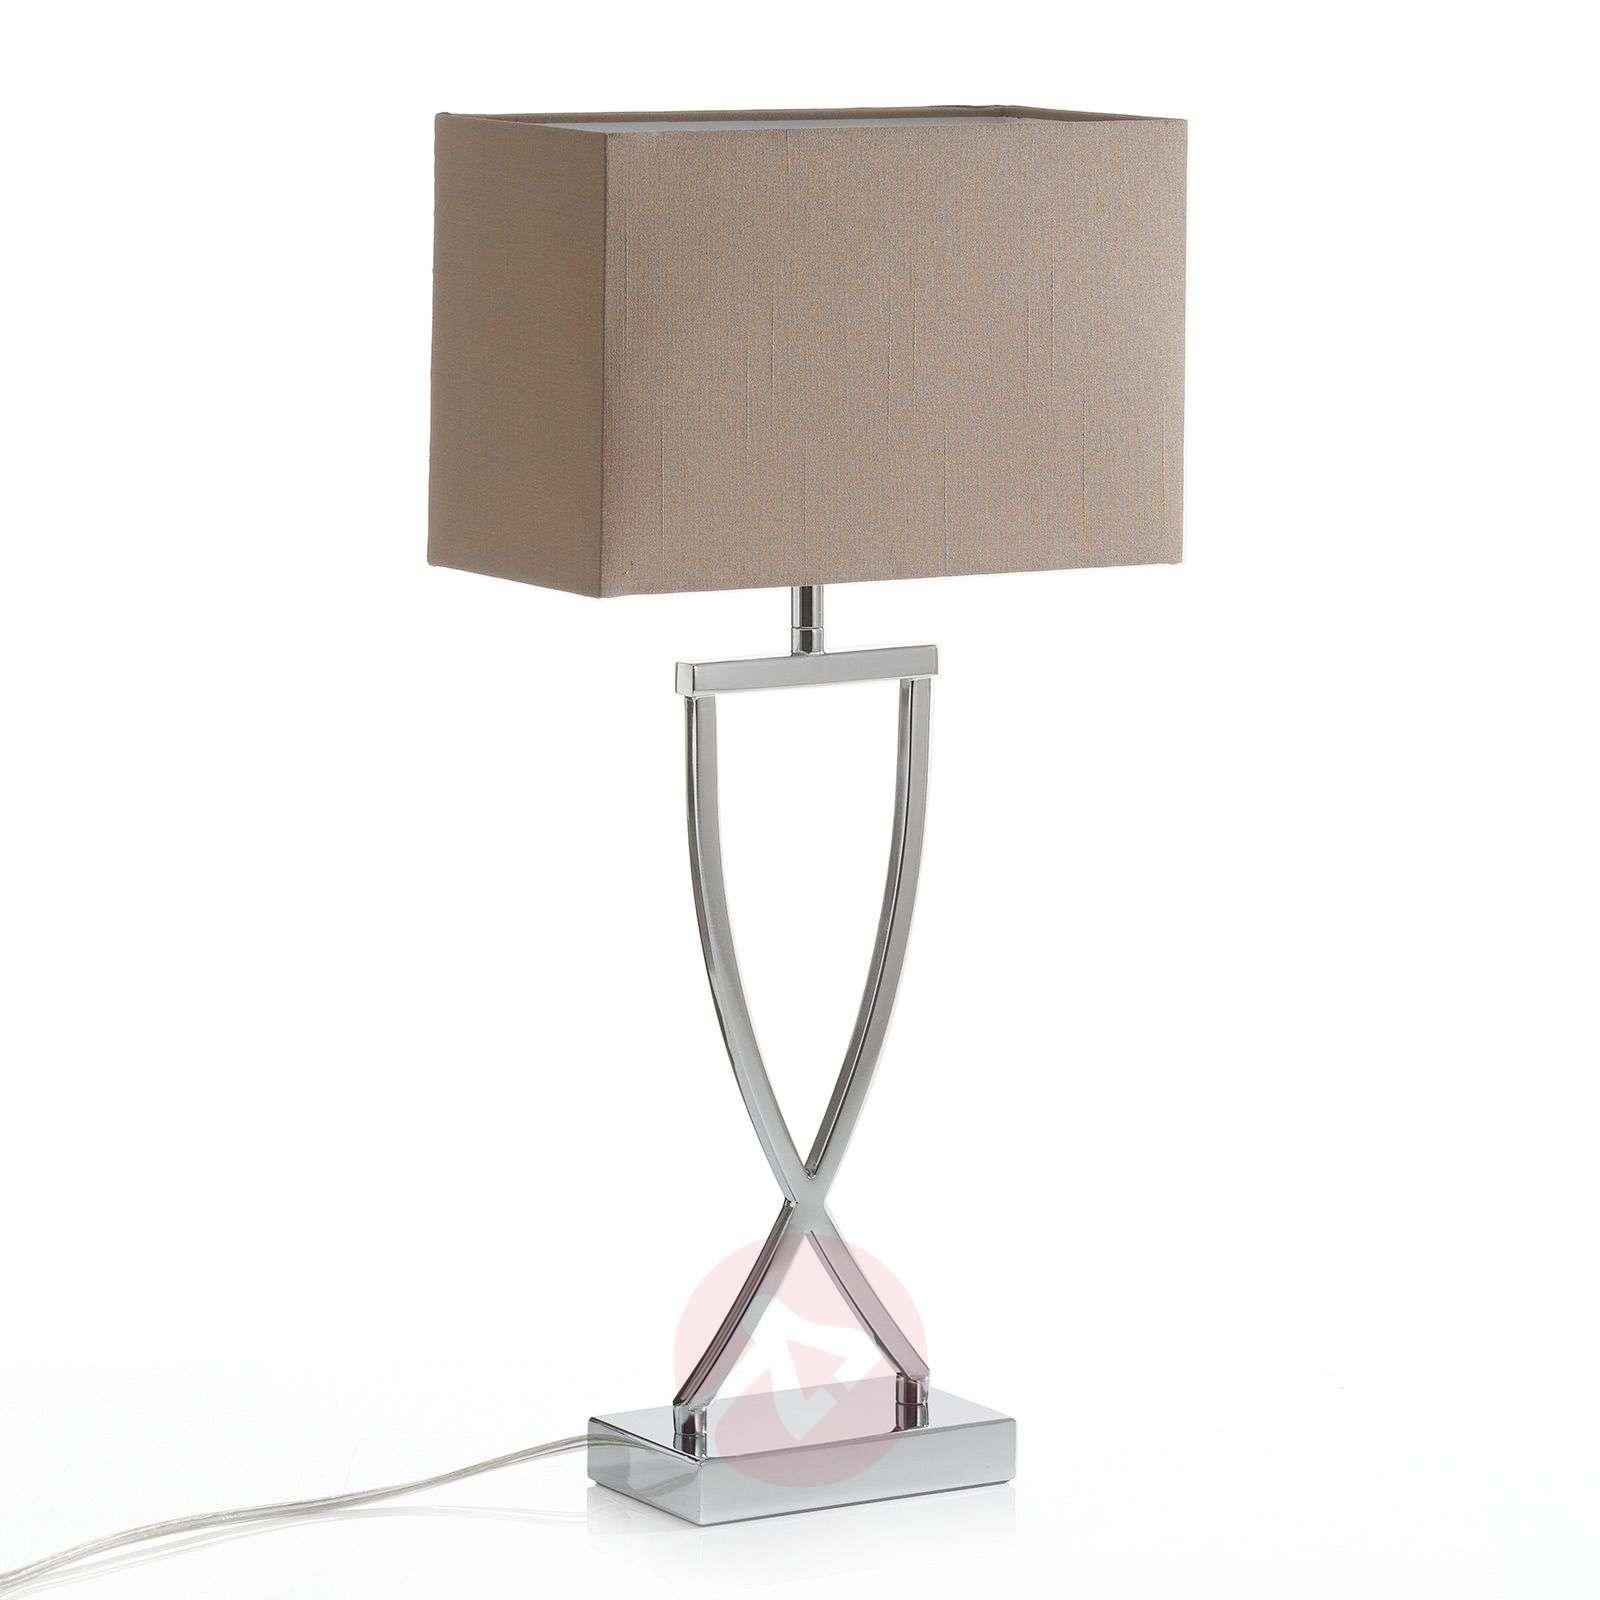 Modern fabric table lamp Anni chrome-cappuccino-4581008-01